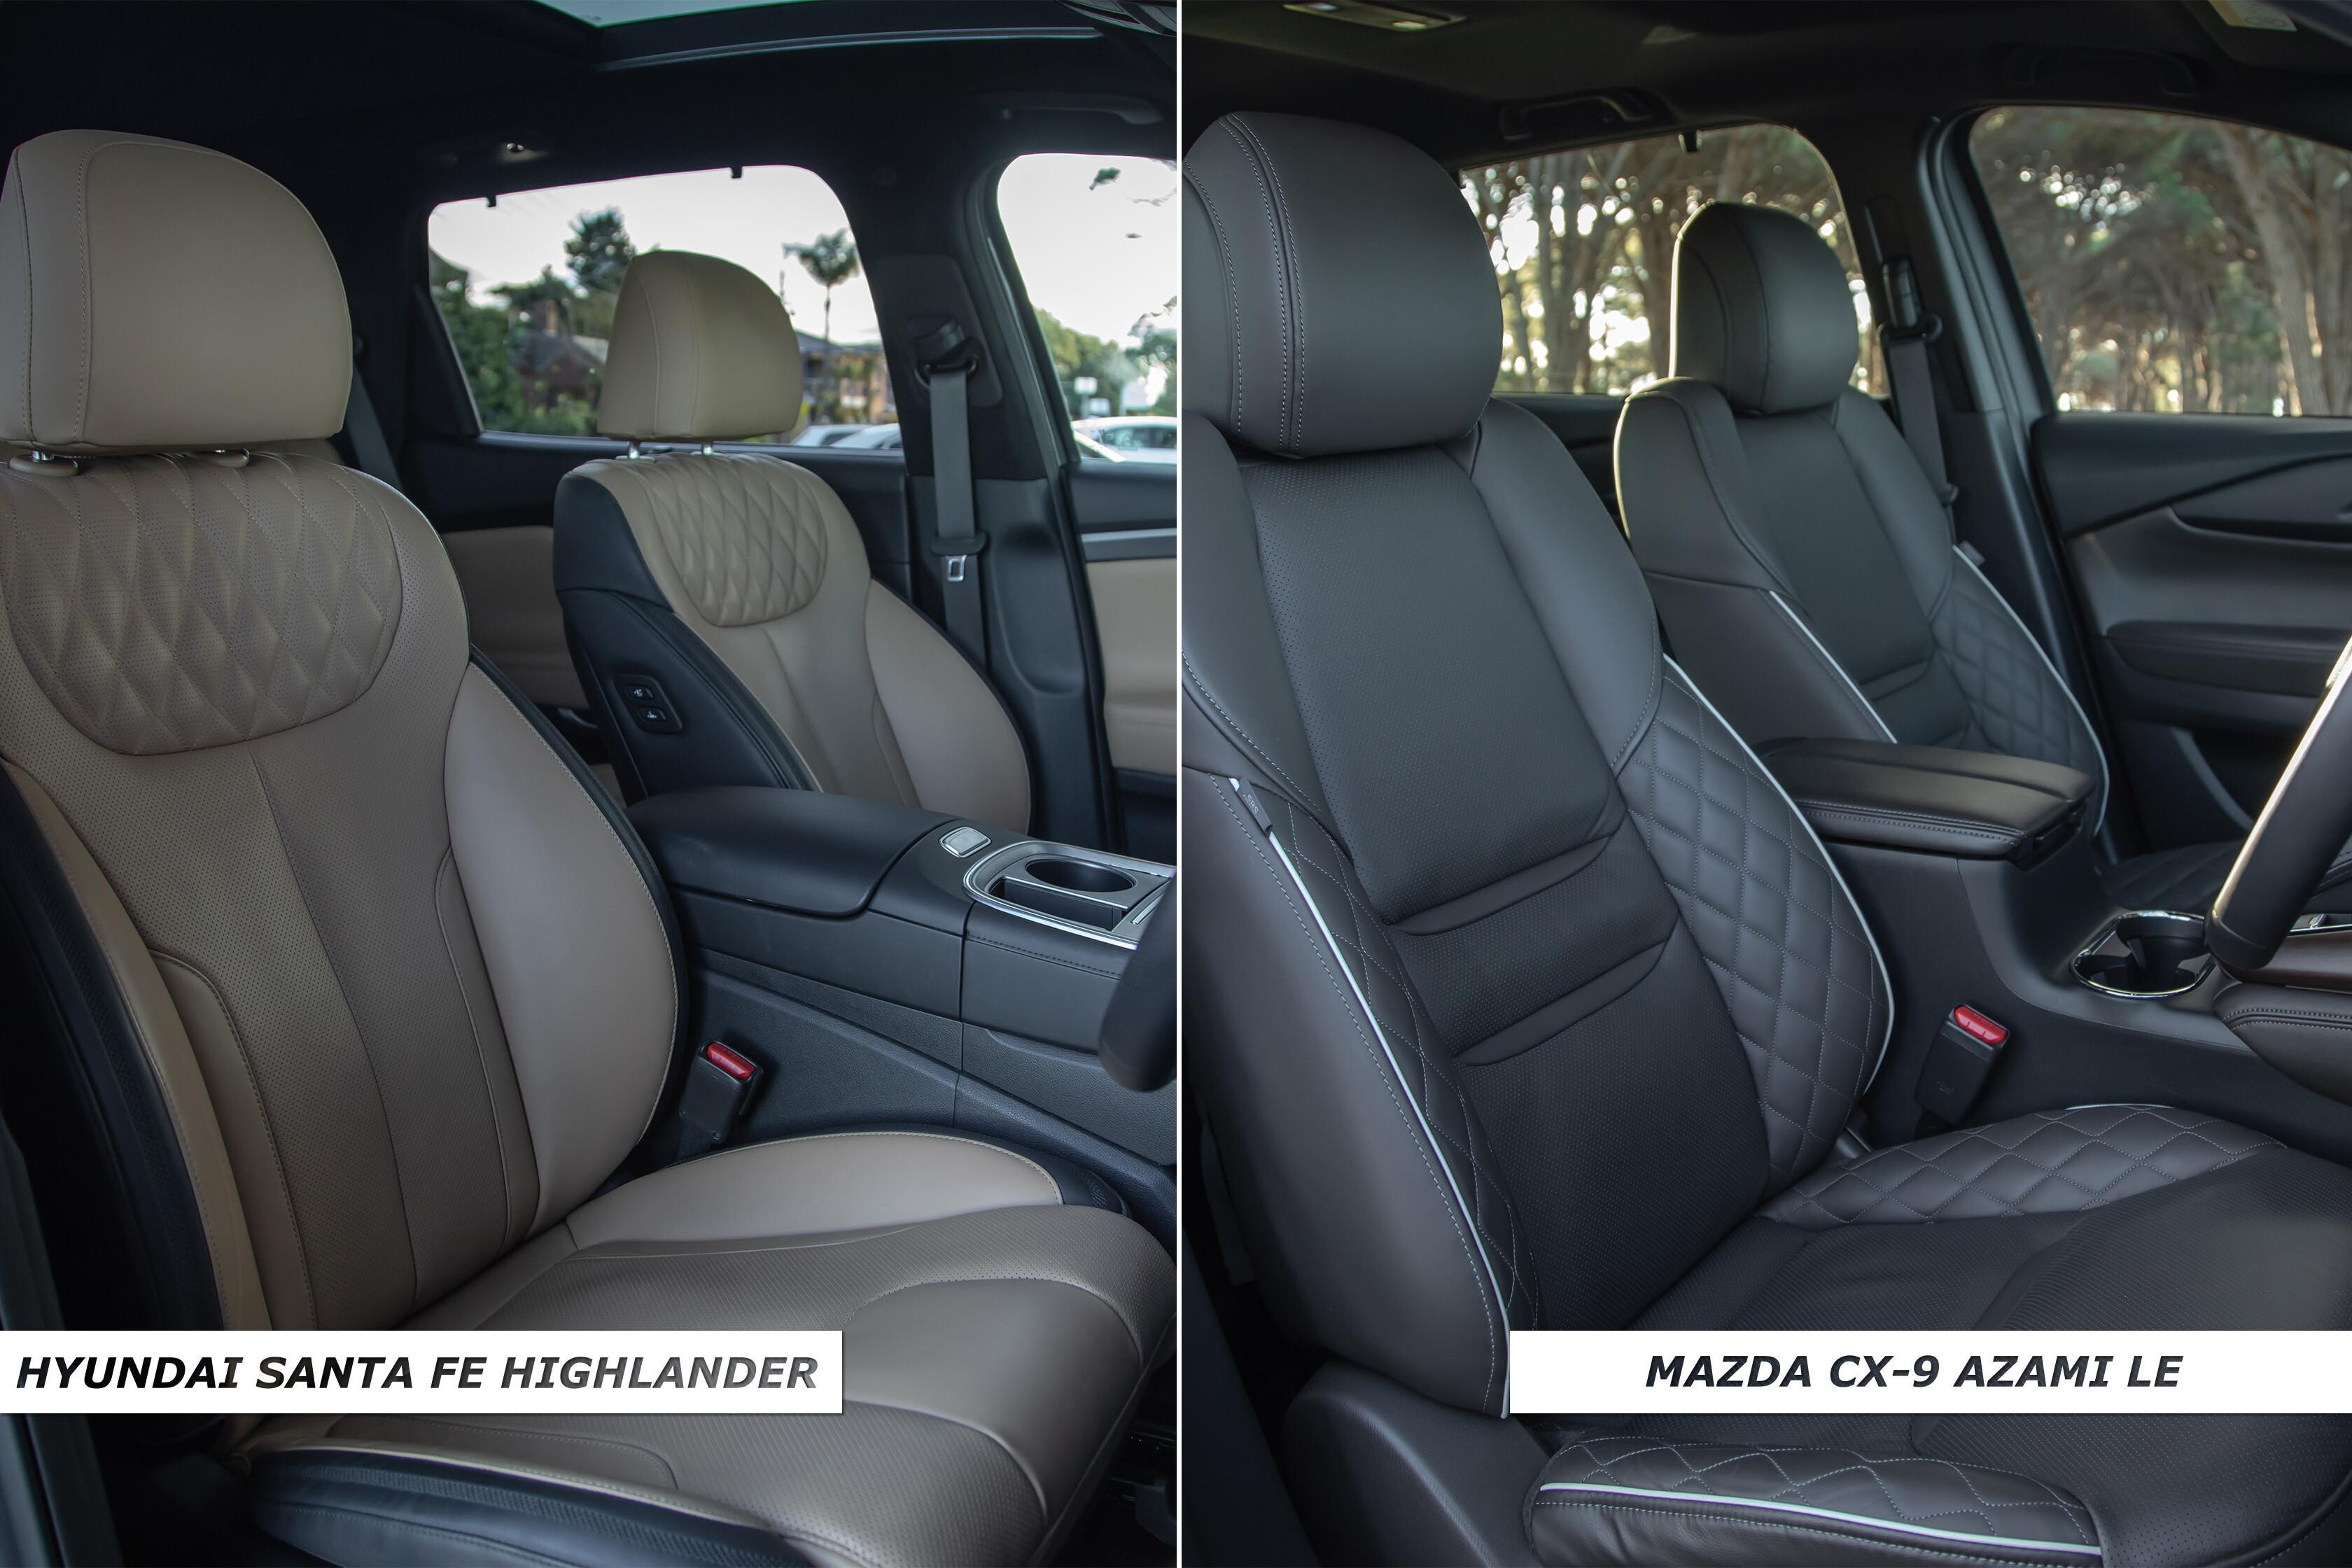 Which Car Car Reviews 2021 Hyundai Santa Fe Highlander Diesel Vs Mazda CX 9 Azami AWD Front Seat Comparison